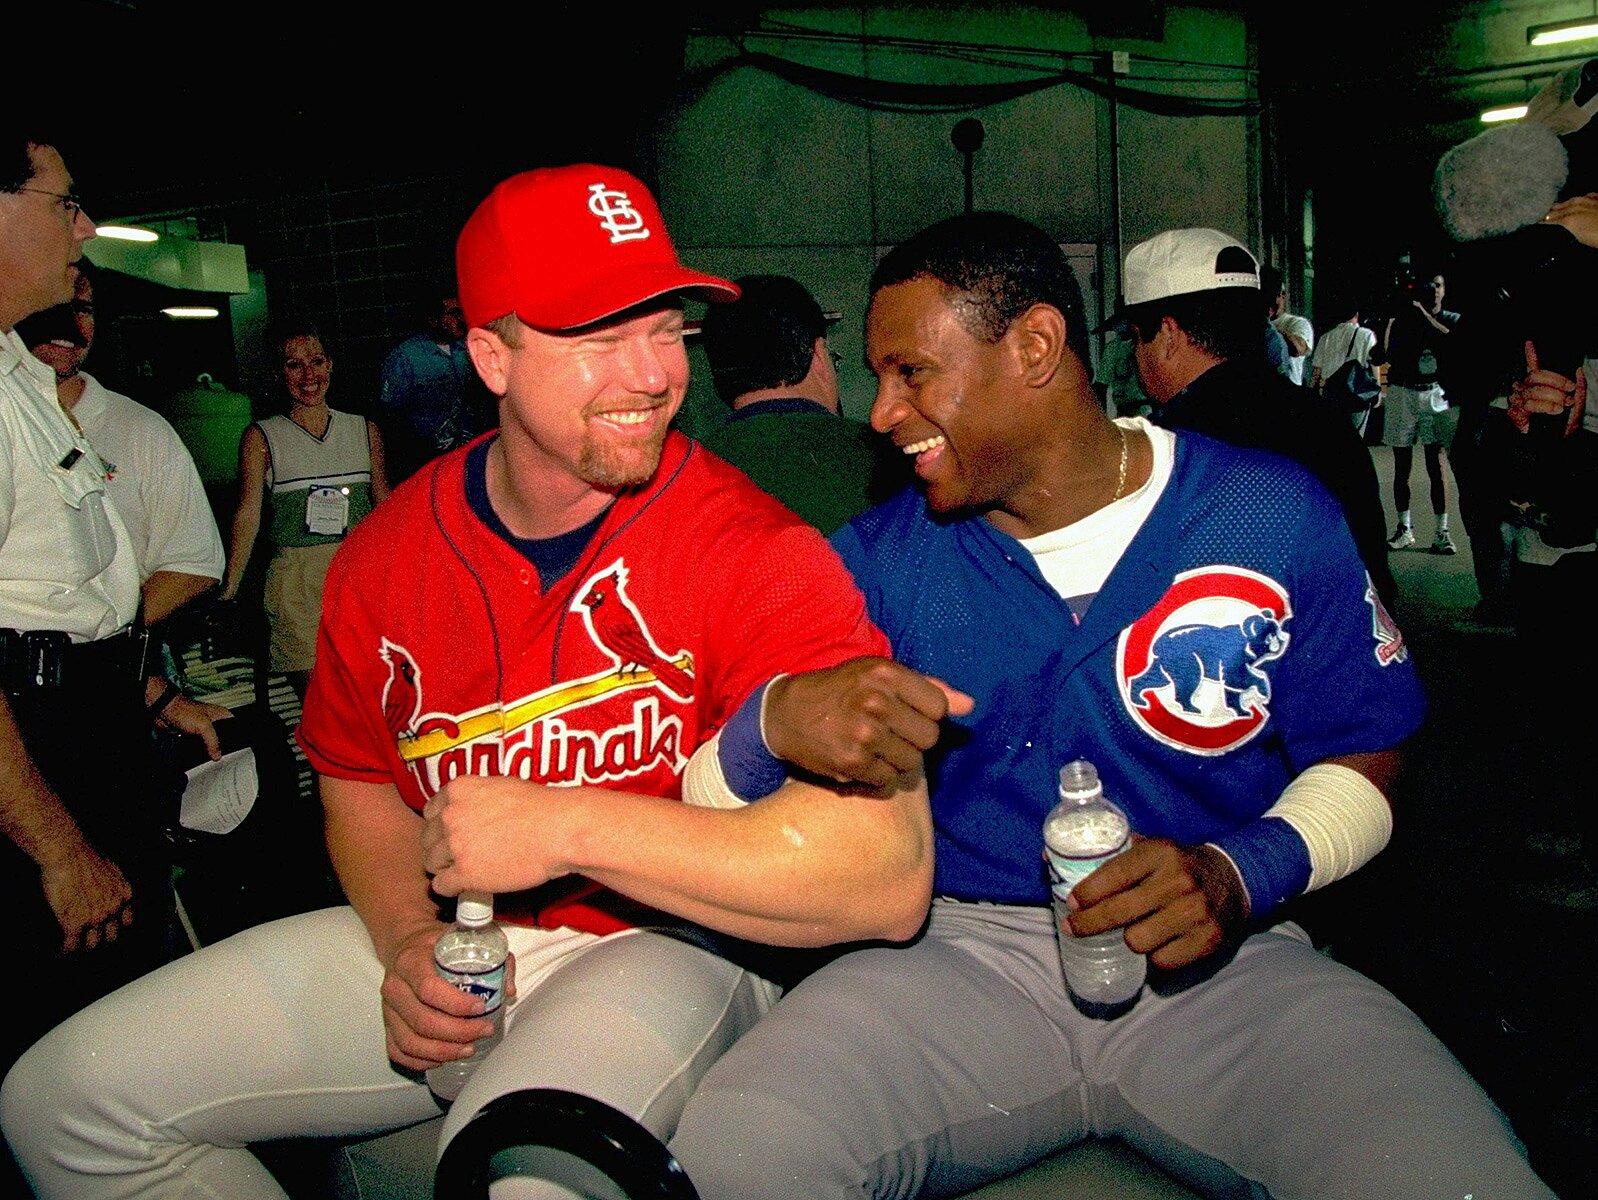 3a61f008e Sammy Sosa goes long on 1998, the Cubs and Mark McGwire | SI.com